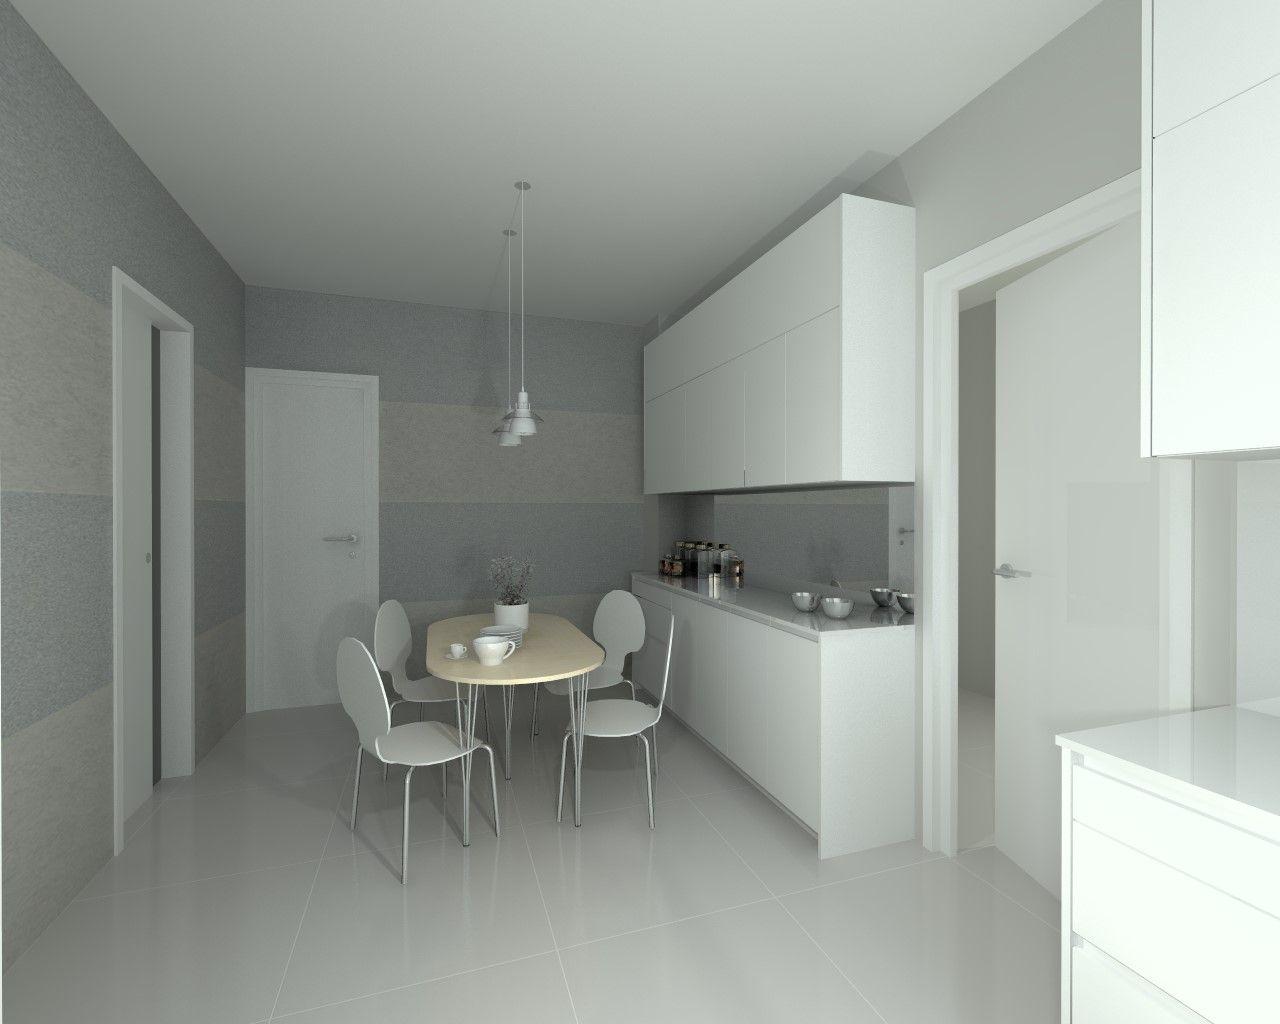 Modelo line e blanco encimera granito cocina - Encimera granito blanco ...